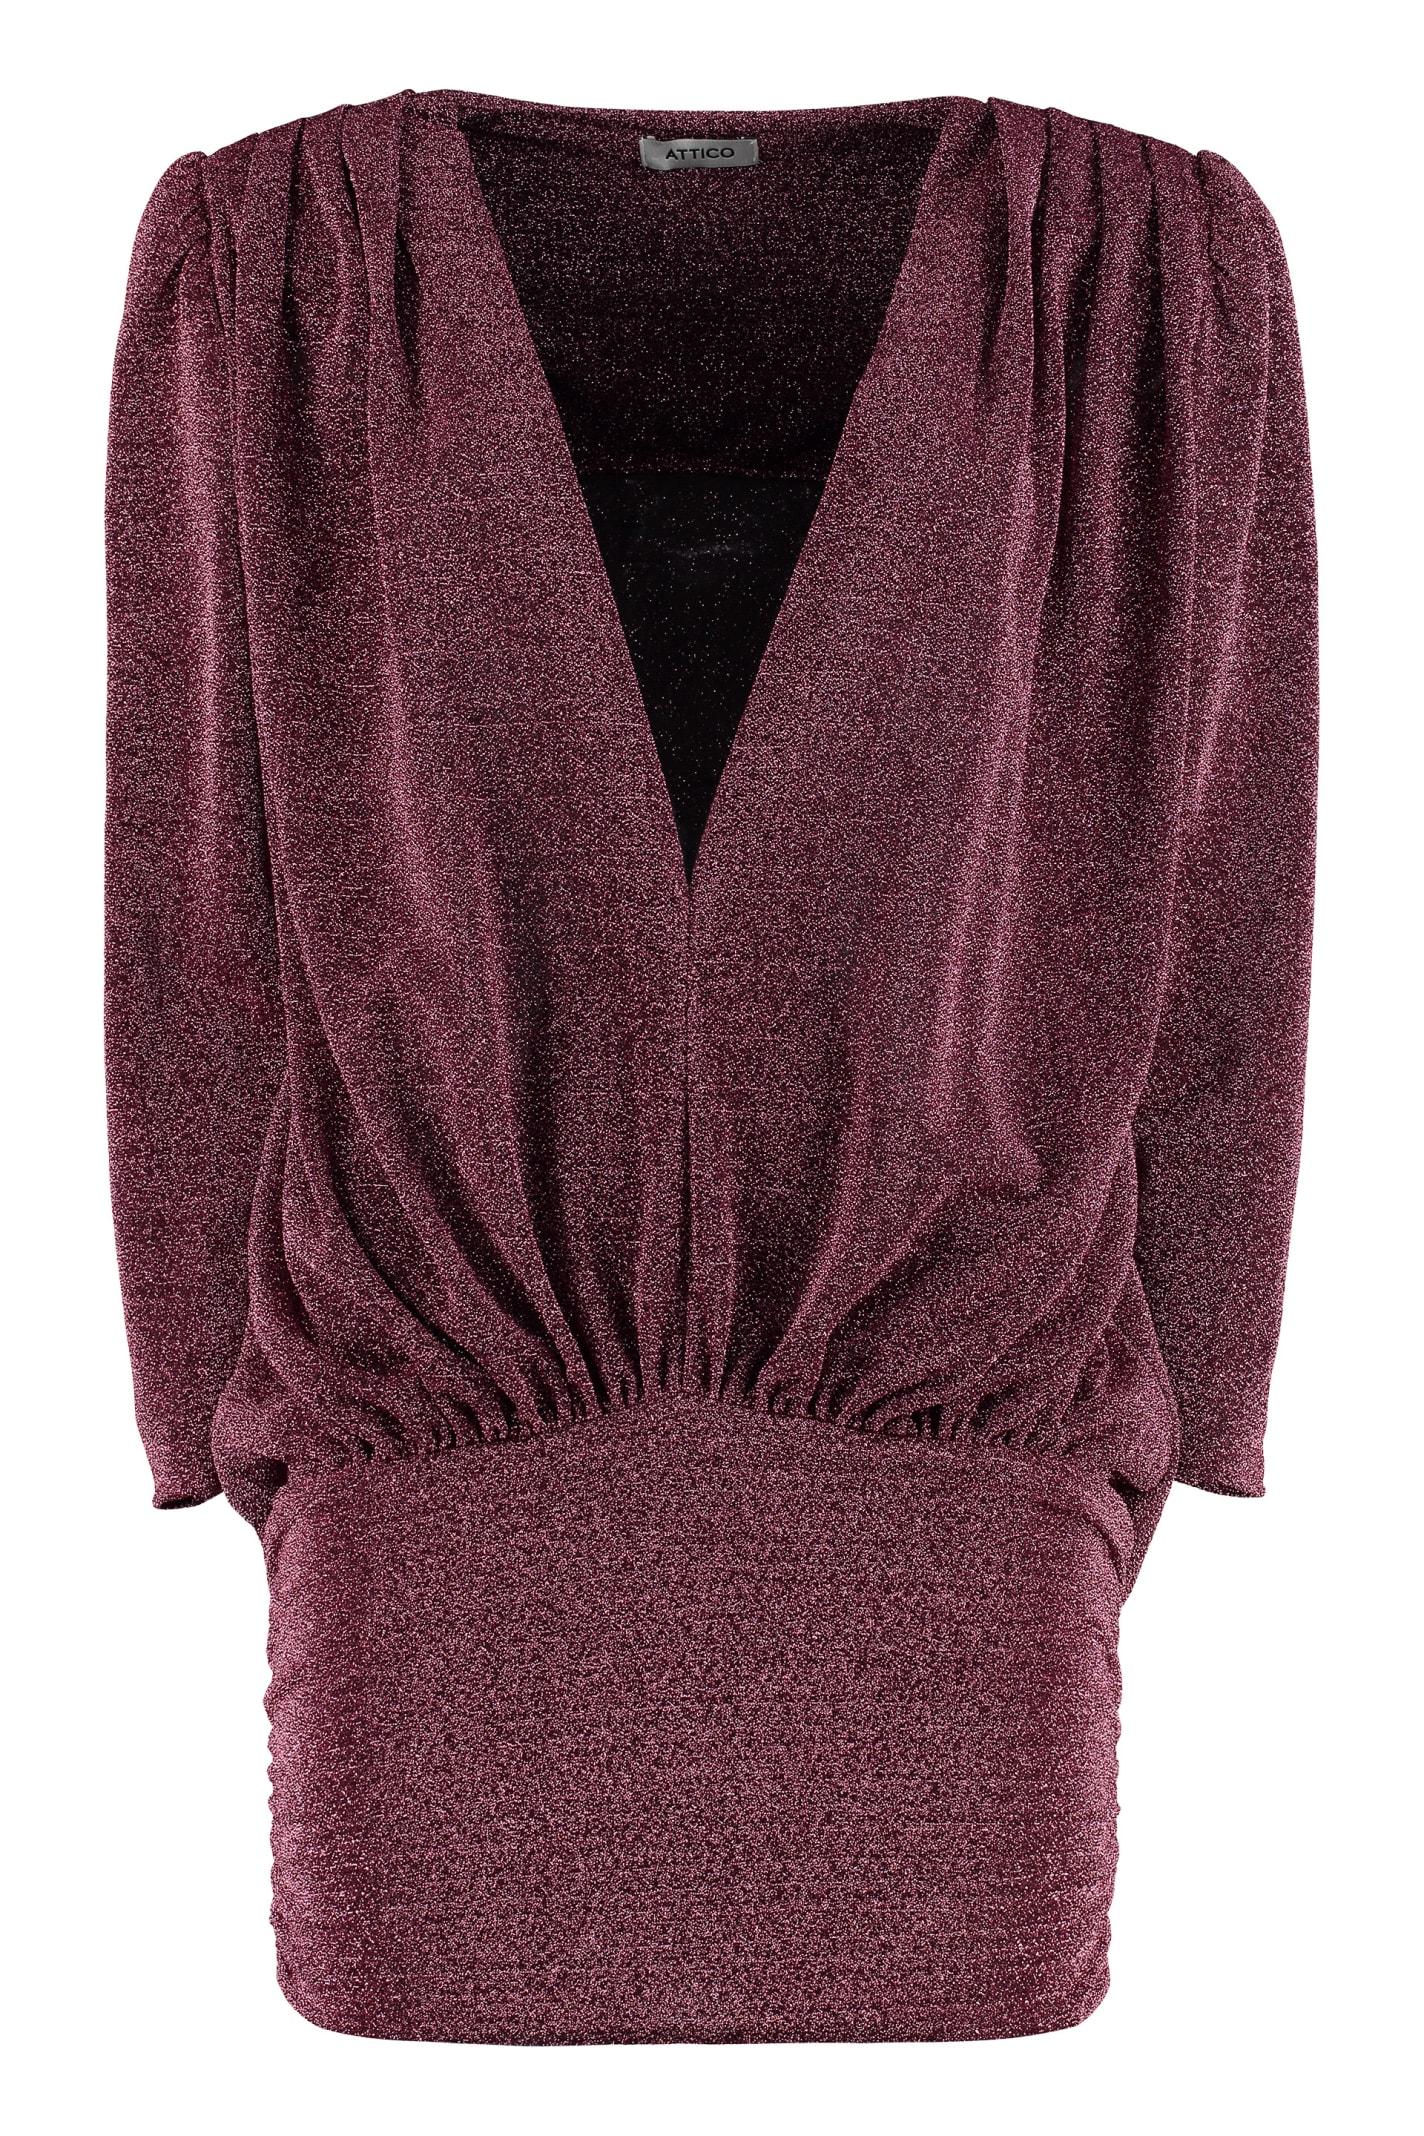 The Attico Knitted Lurex Mini-dress